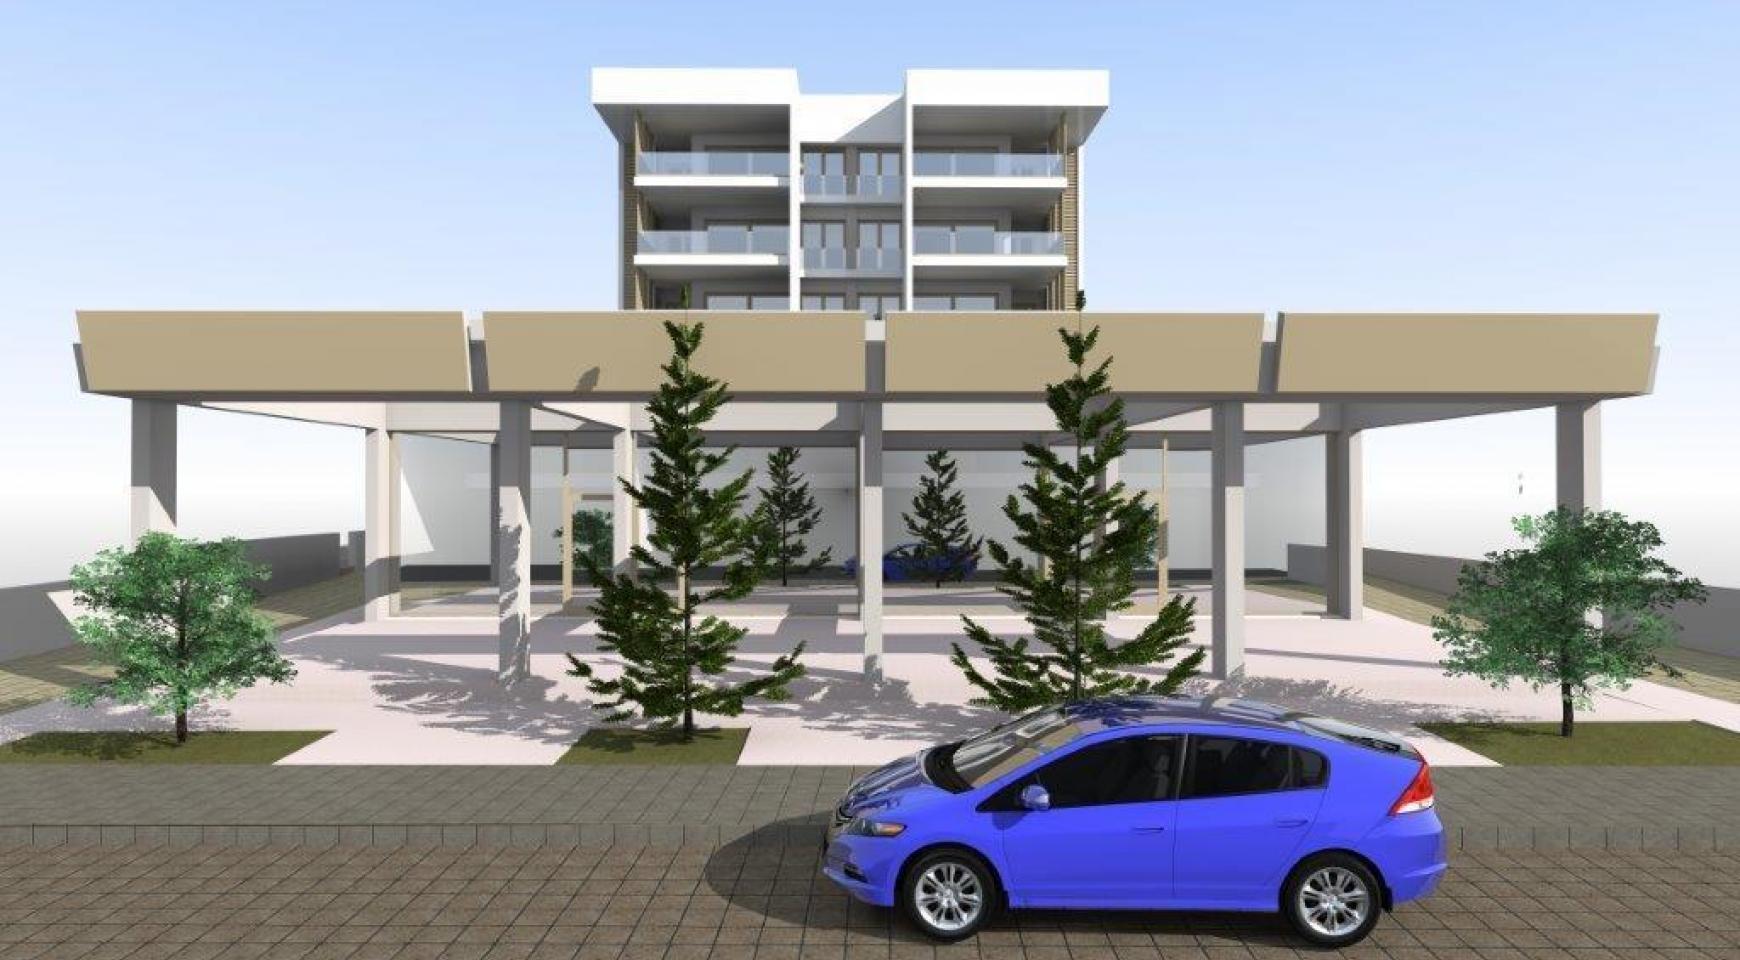 New Spacious 3 Bedroom Apartment  near the Sea - 4